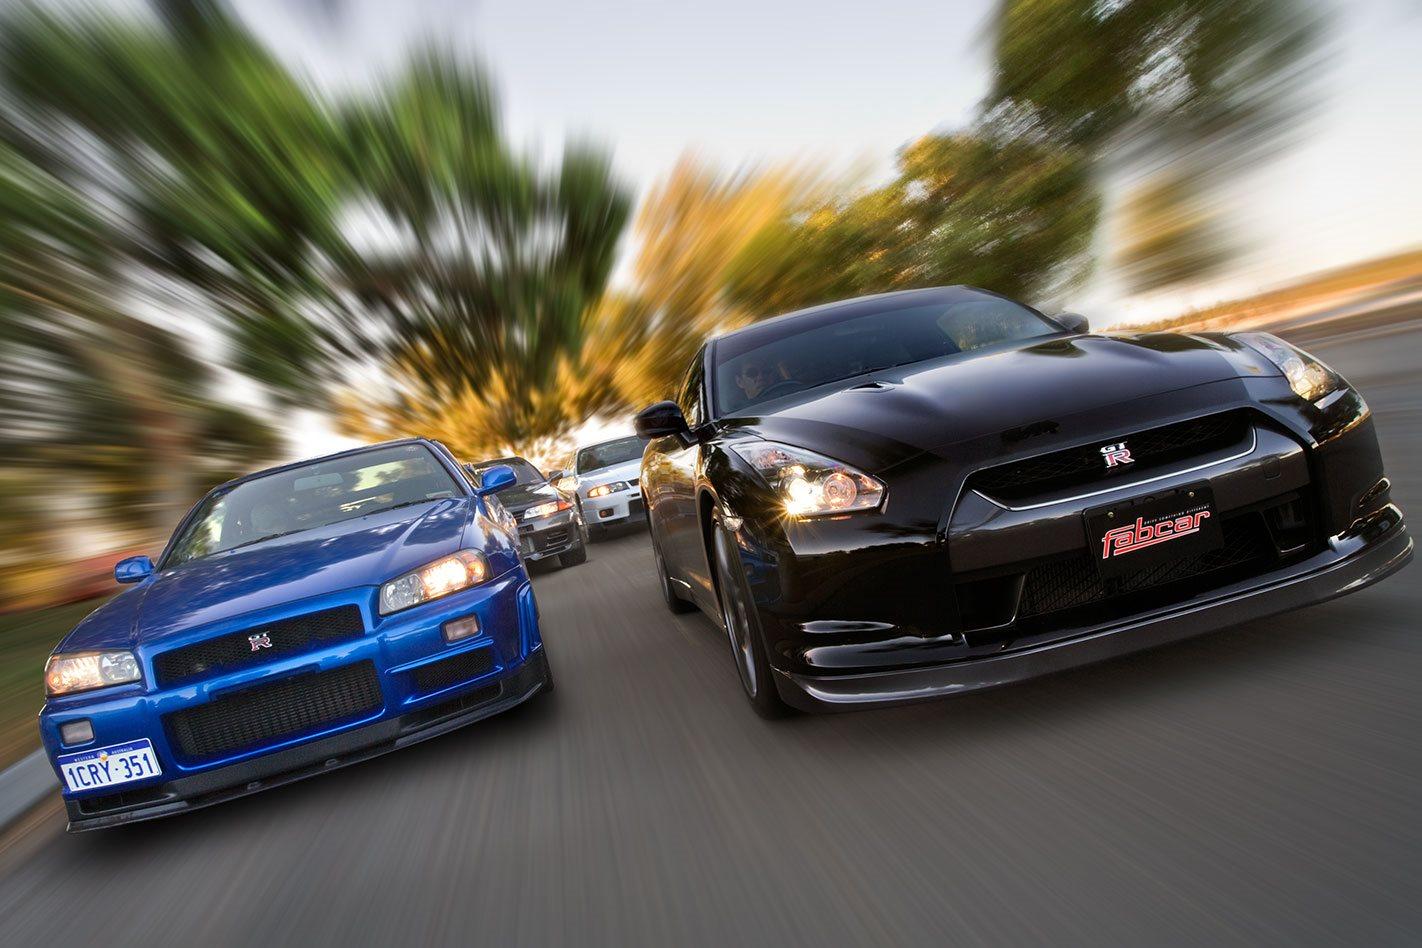 Nissan gt r r32 vs r33 vs r34 vs r35 comparison classic motor